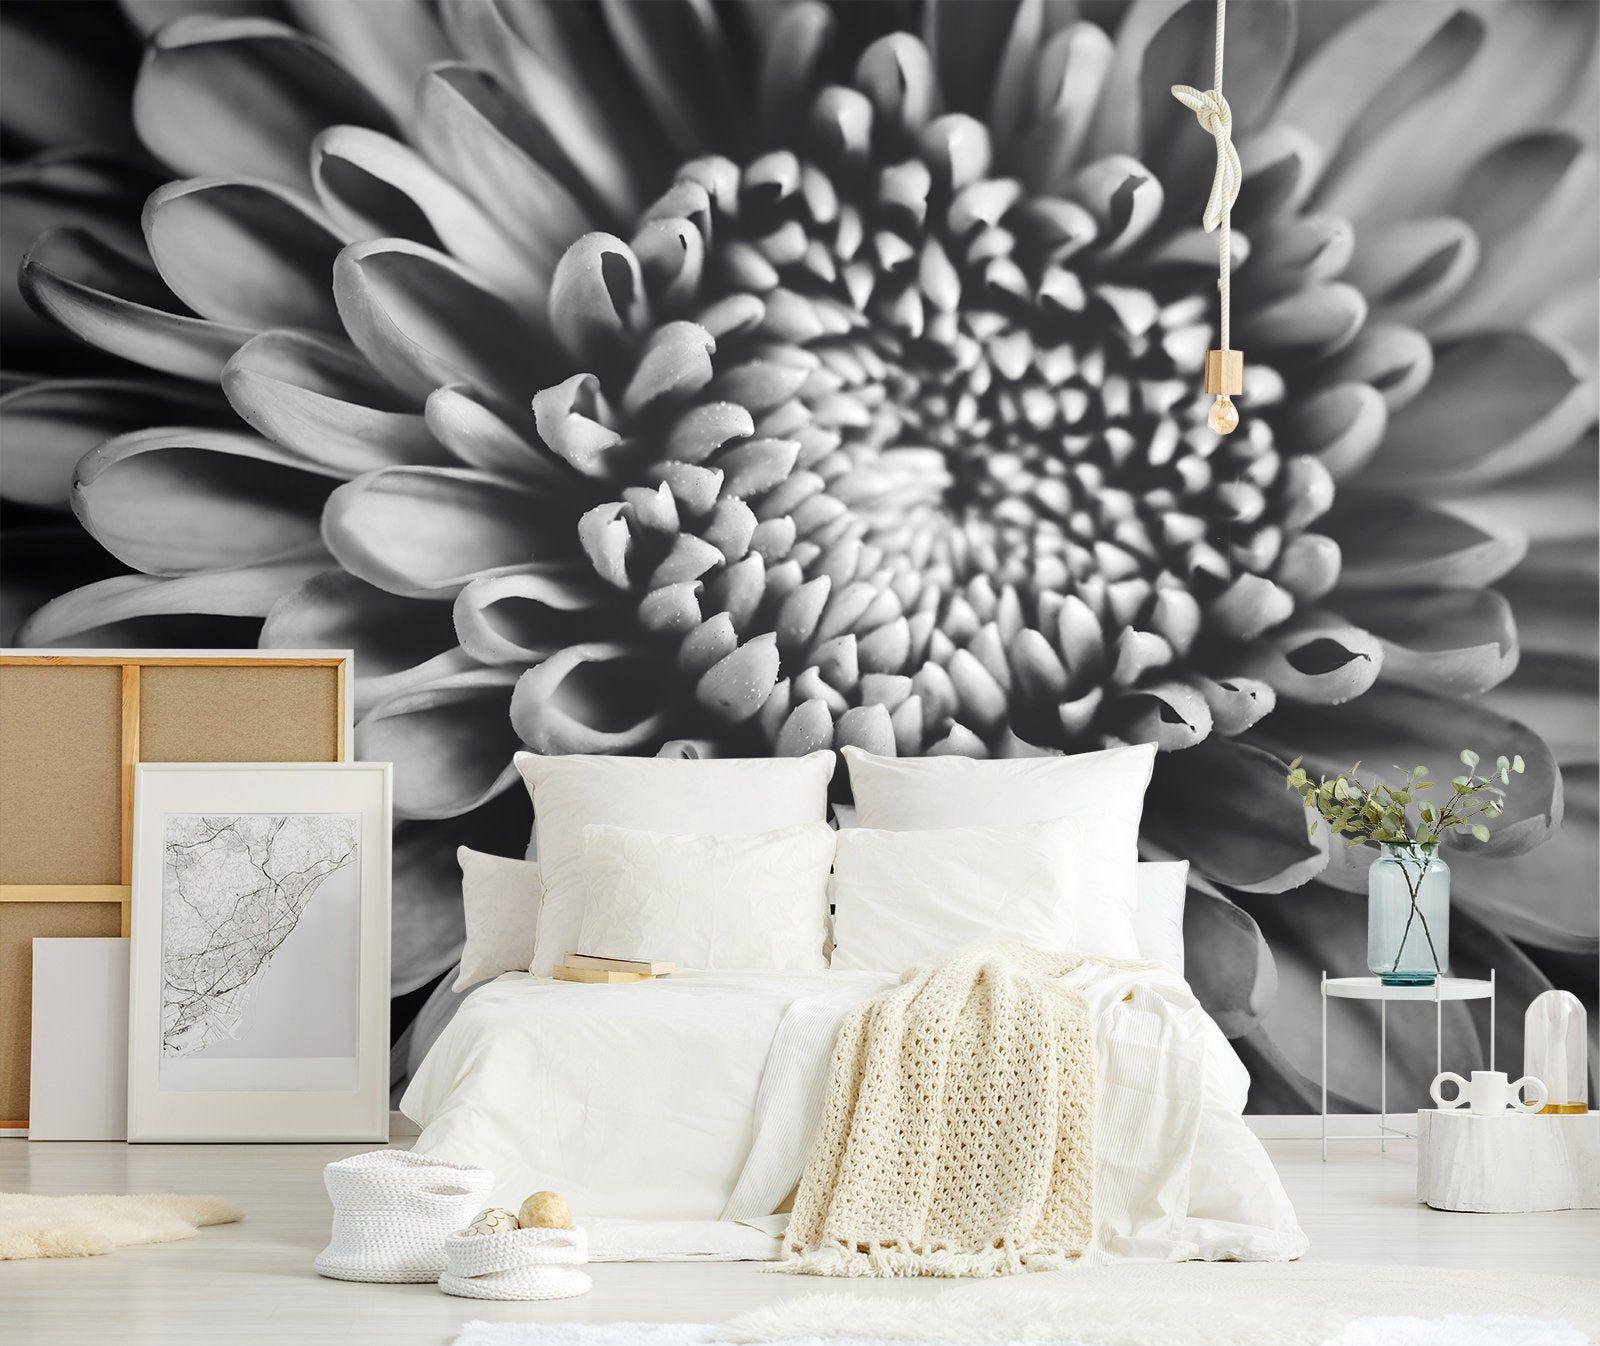 Black and white flower, peel and stick wallpaper, dark